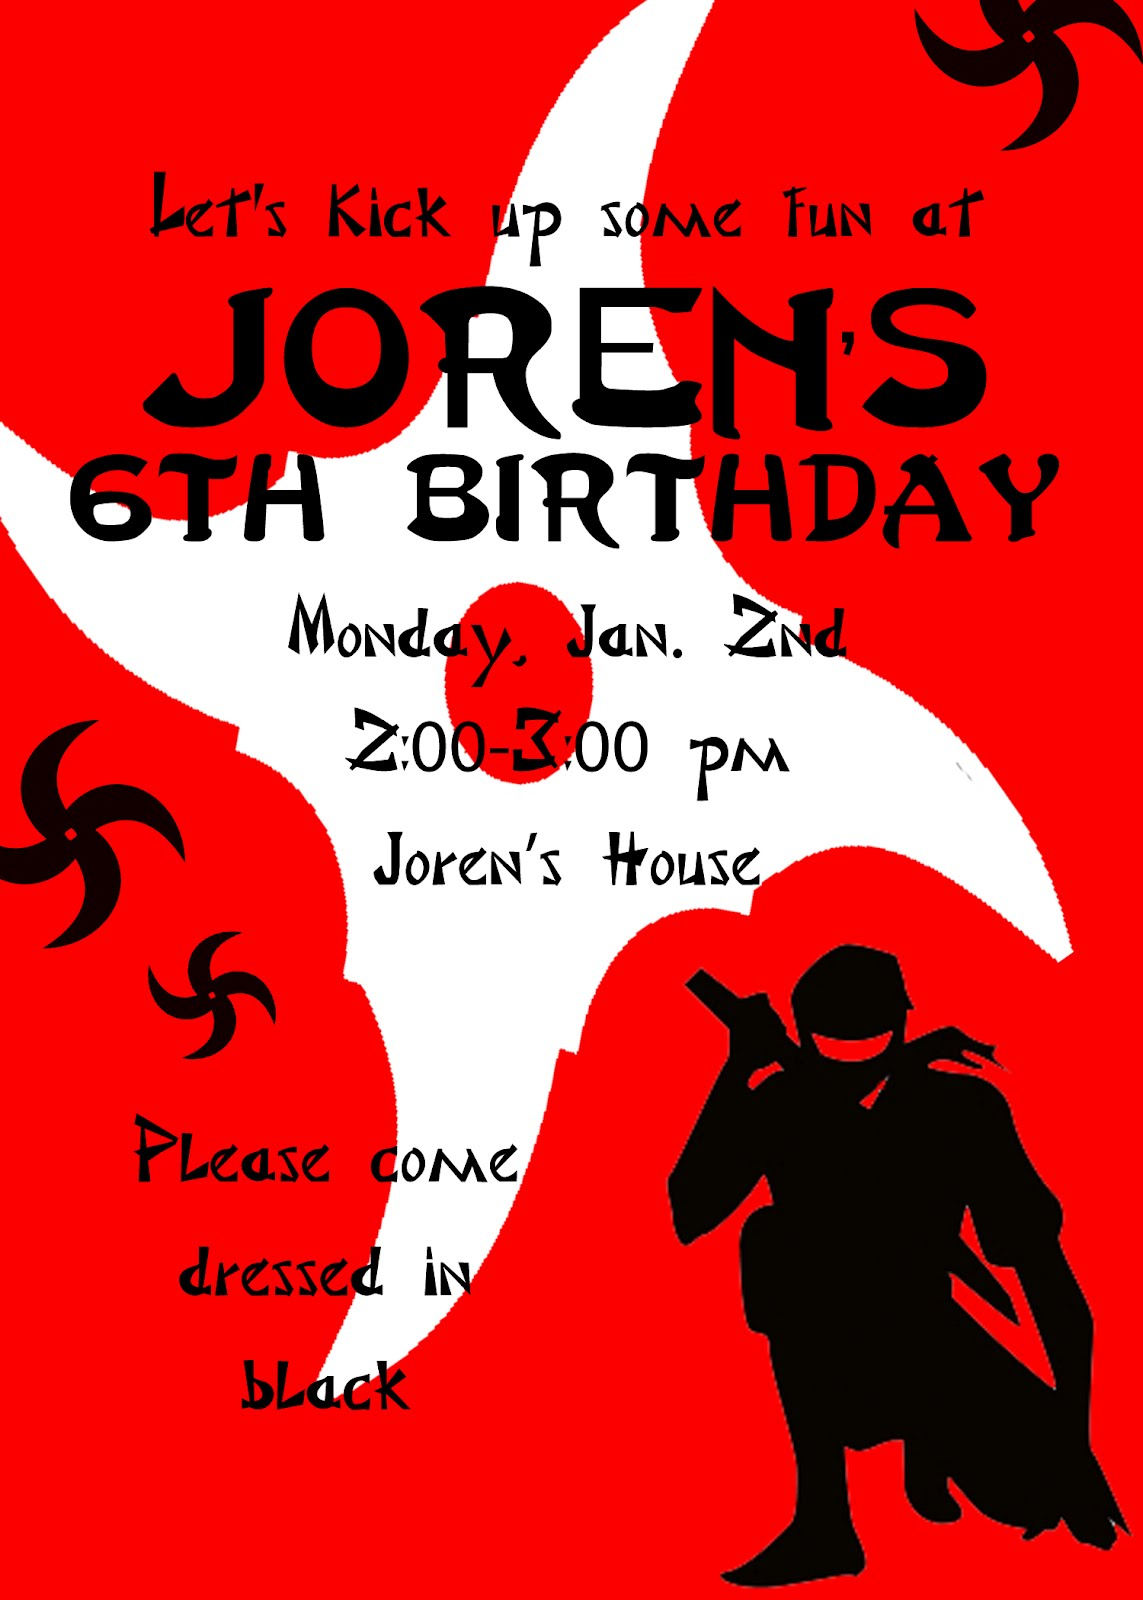 ninja birthday invitations - Vatoz.atozdevelopment.co